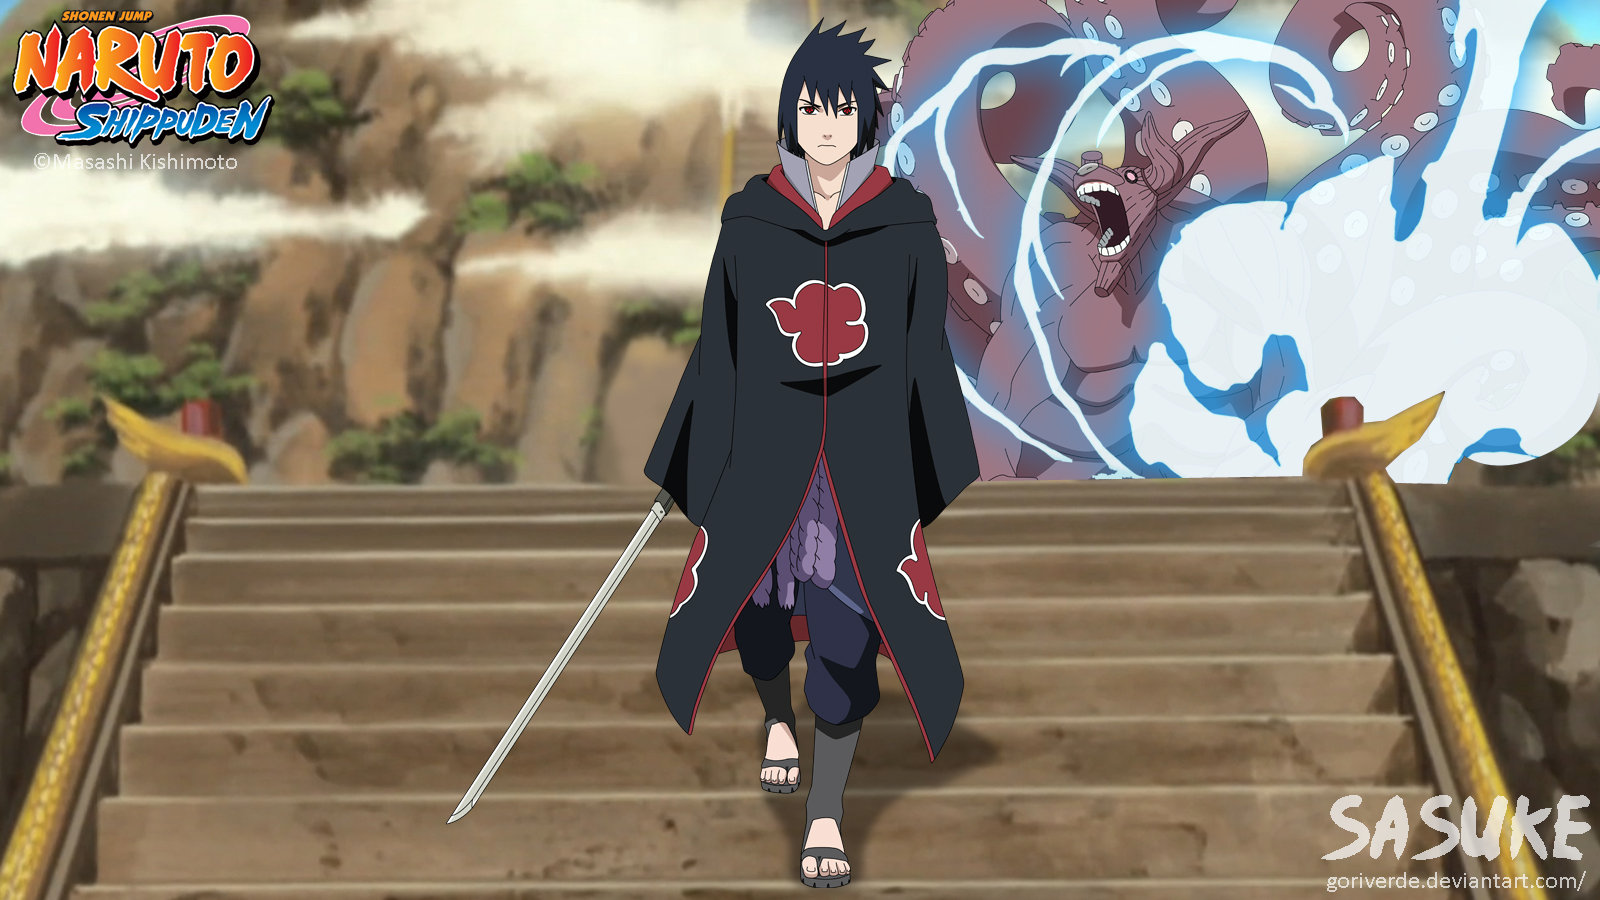 Sasuke (Akatsuki) by goriverde on DeviantArt